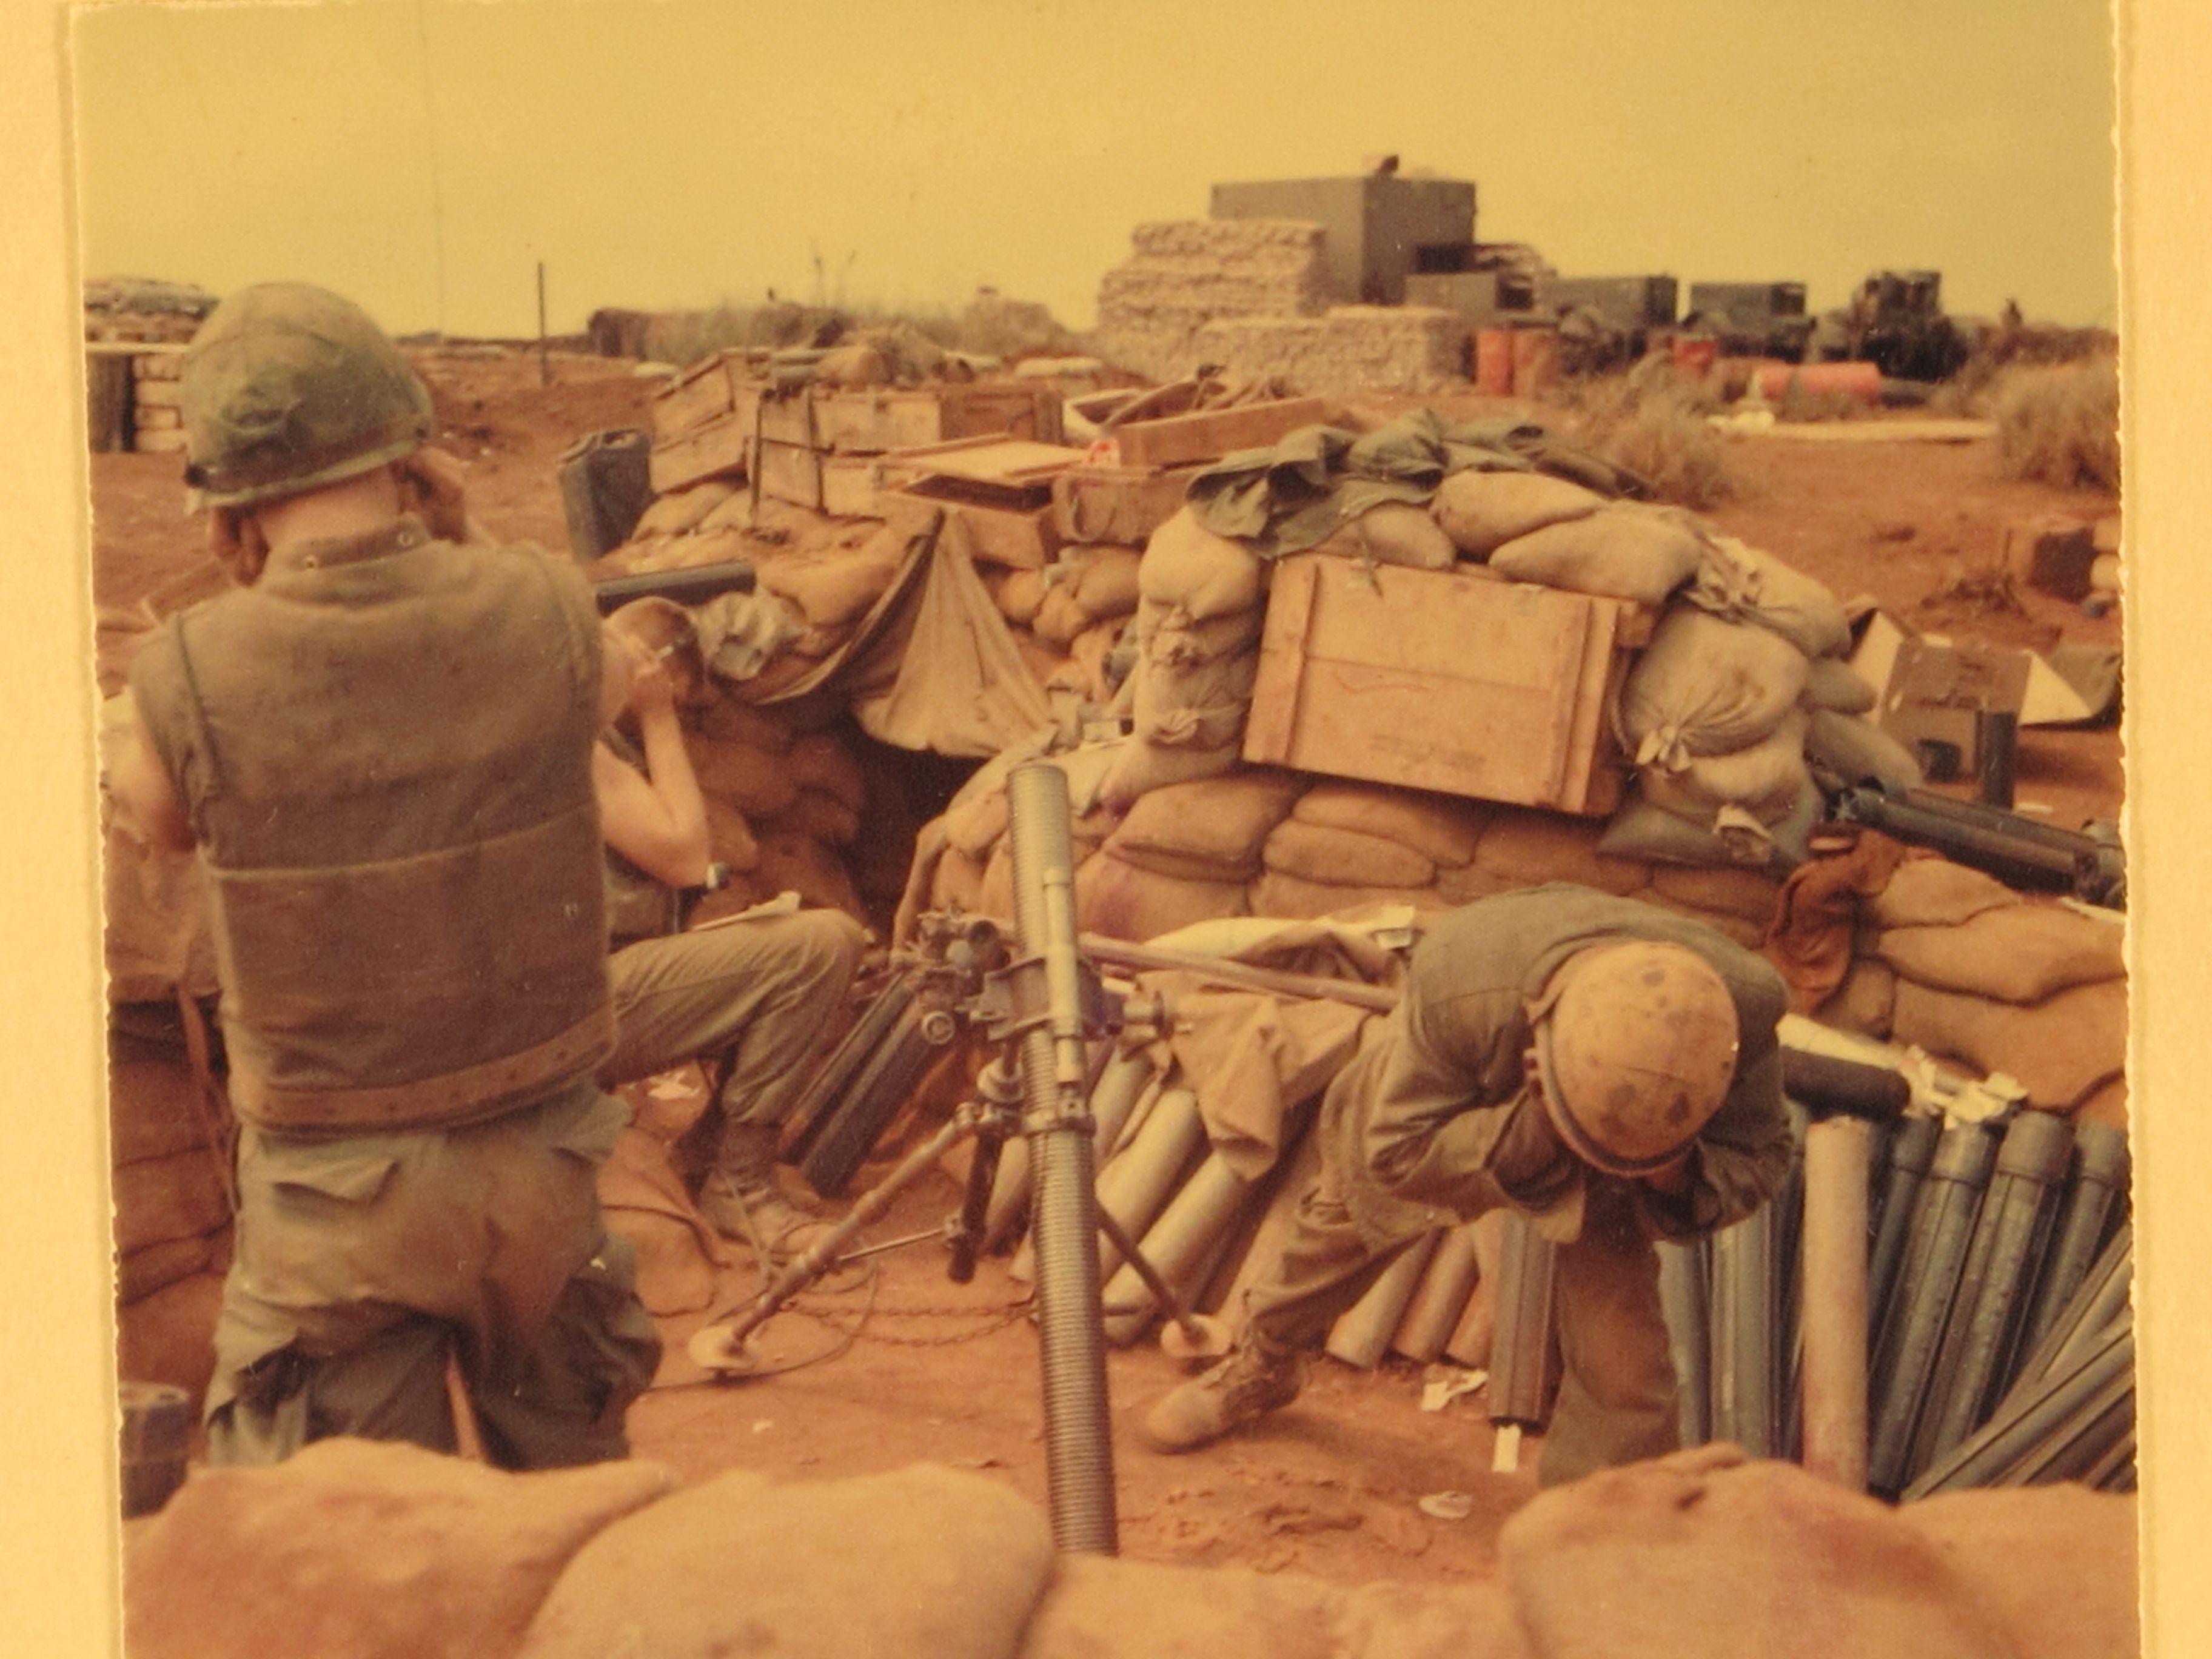 Vietnam Mortar Fire : Fire mission mm mortar crew firing at the nva